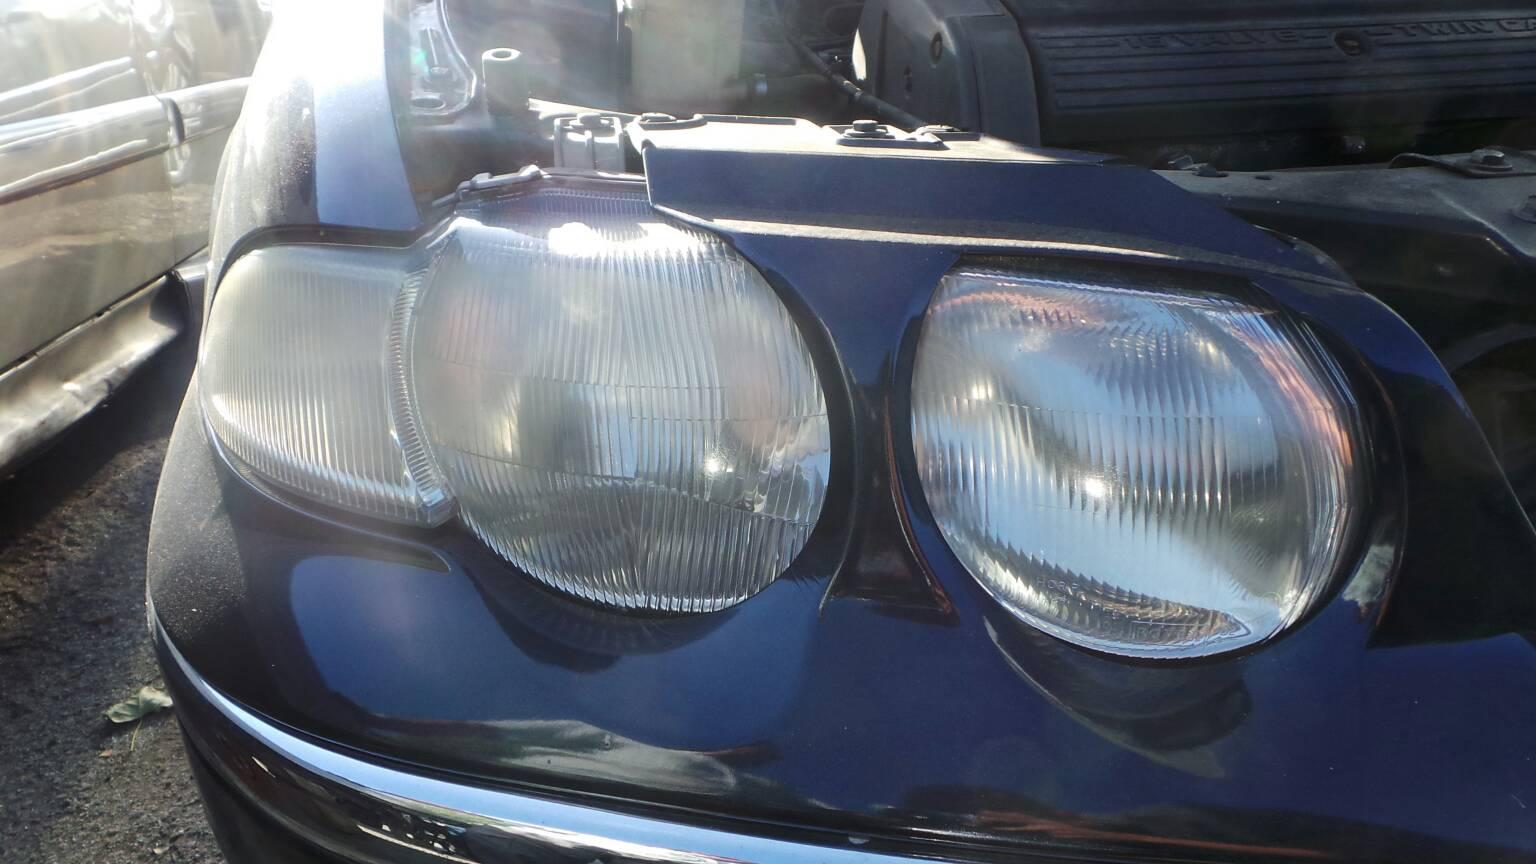 Ótica Dto ROVER 45 Hatchback (RT) | 00 - 05